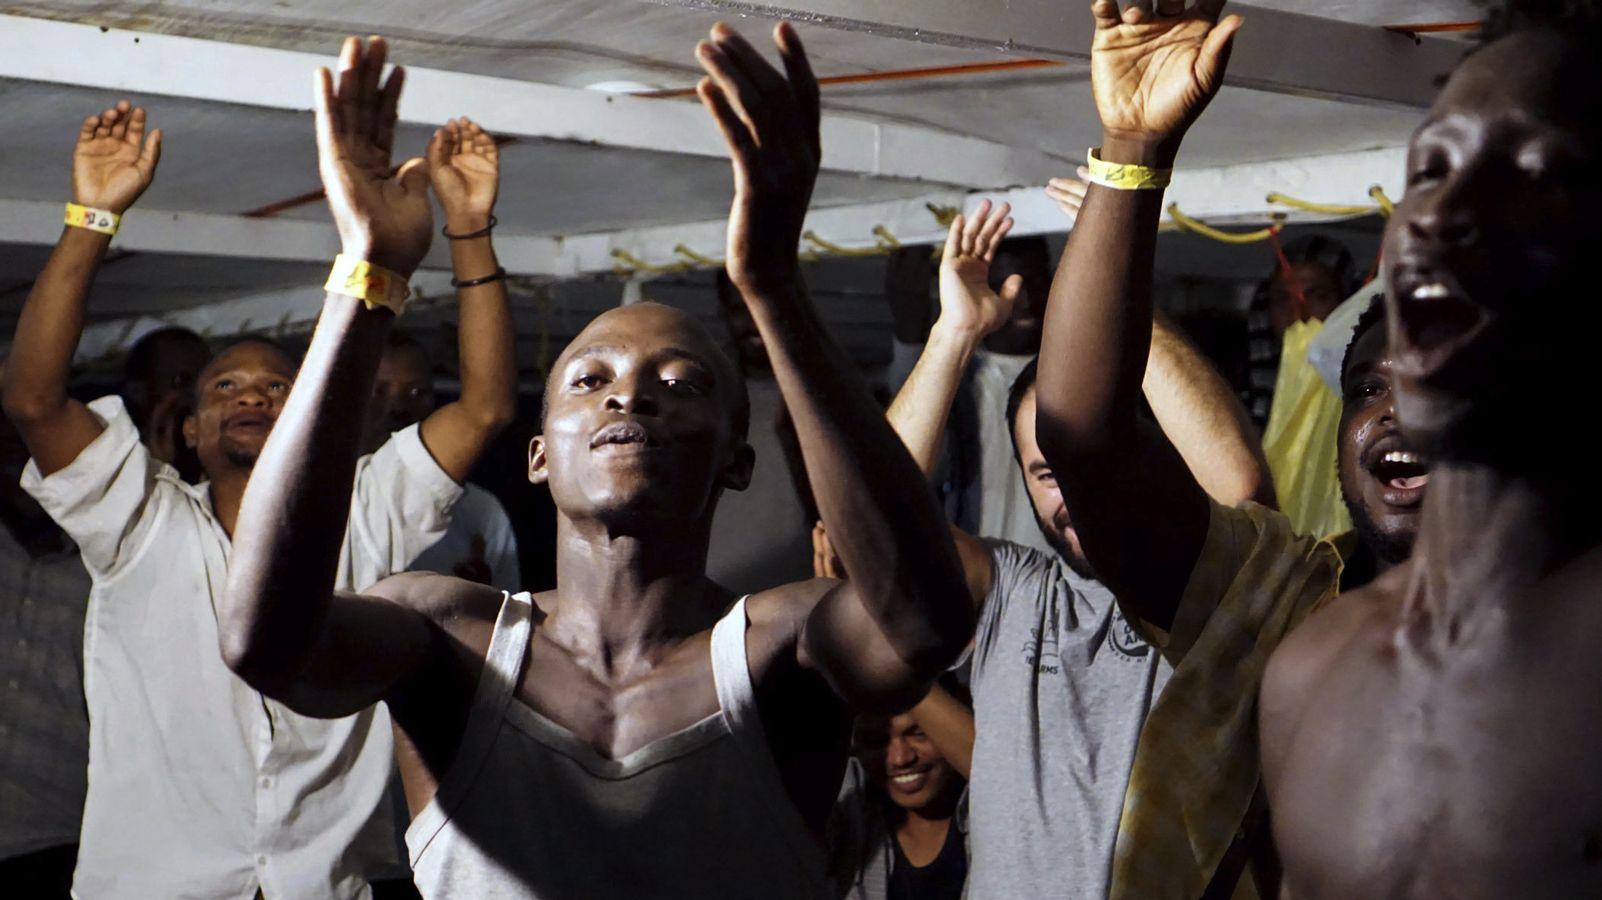 Italien Karte Lampedusa.Fluchtlinge Der Open Arms Gehen In Lampedusa An Land Br24